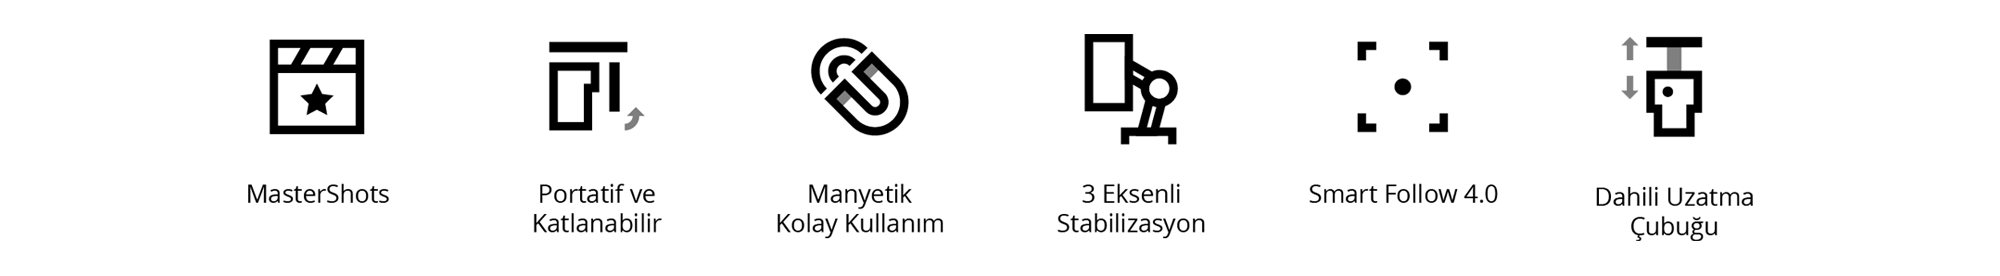 DJI OM5